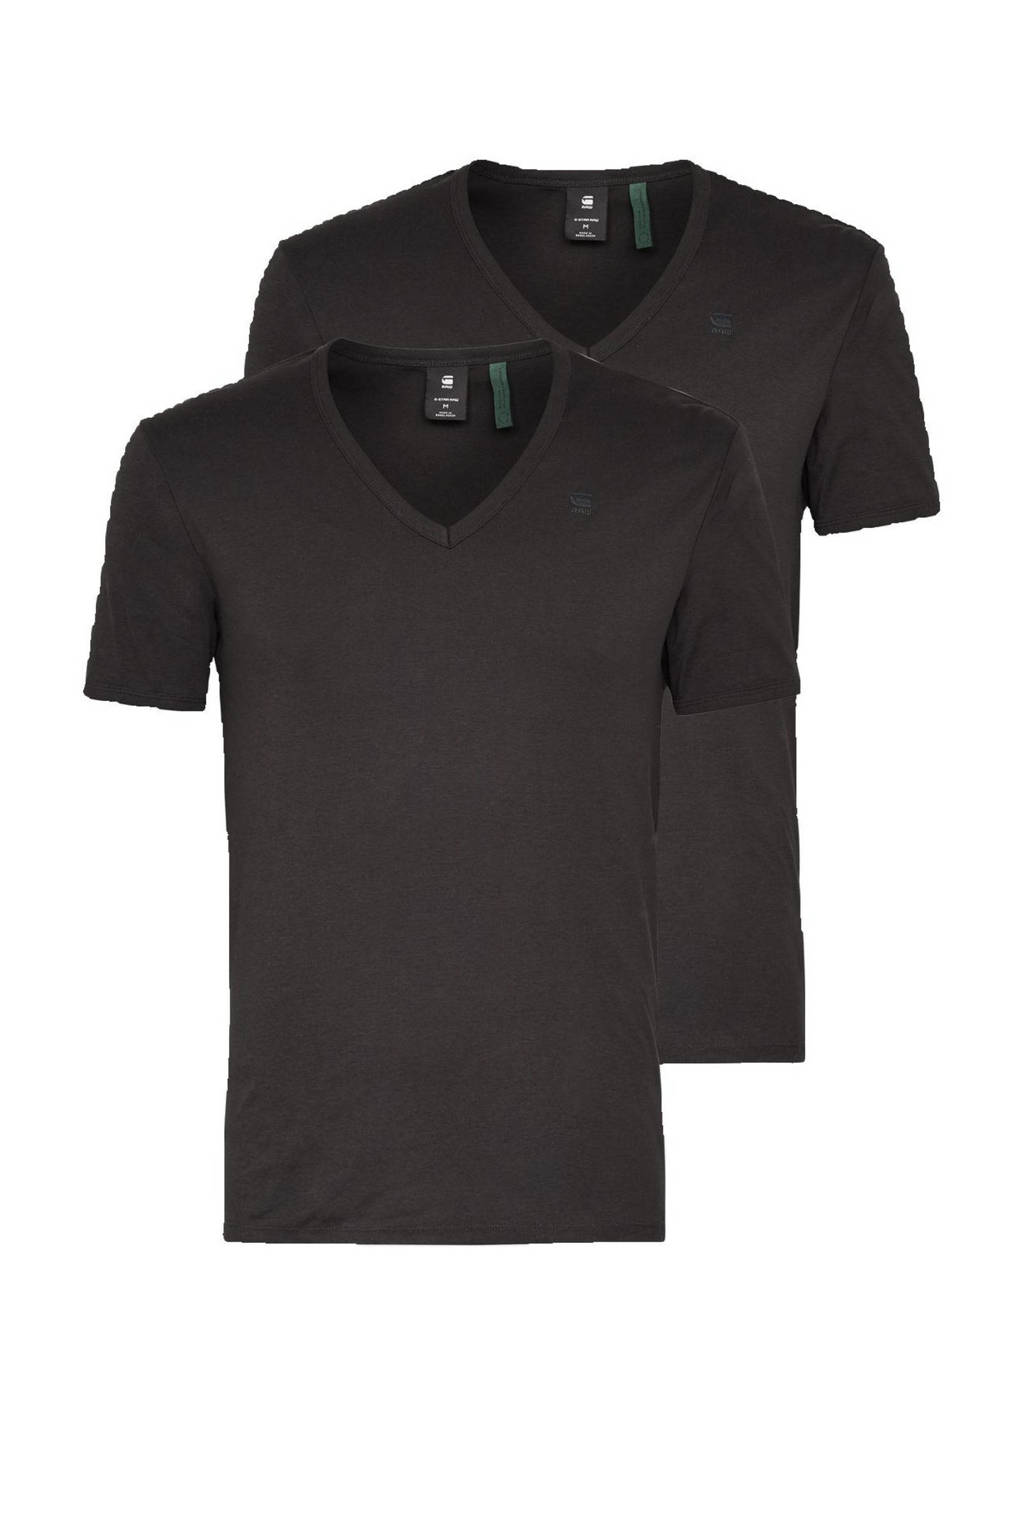 G-Star RAW Base T-shirt (set van 2), Zwart